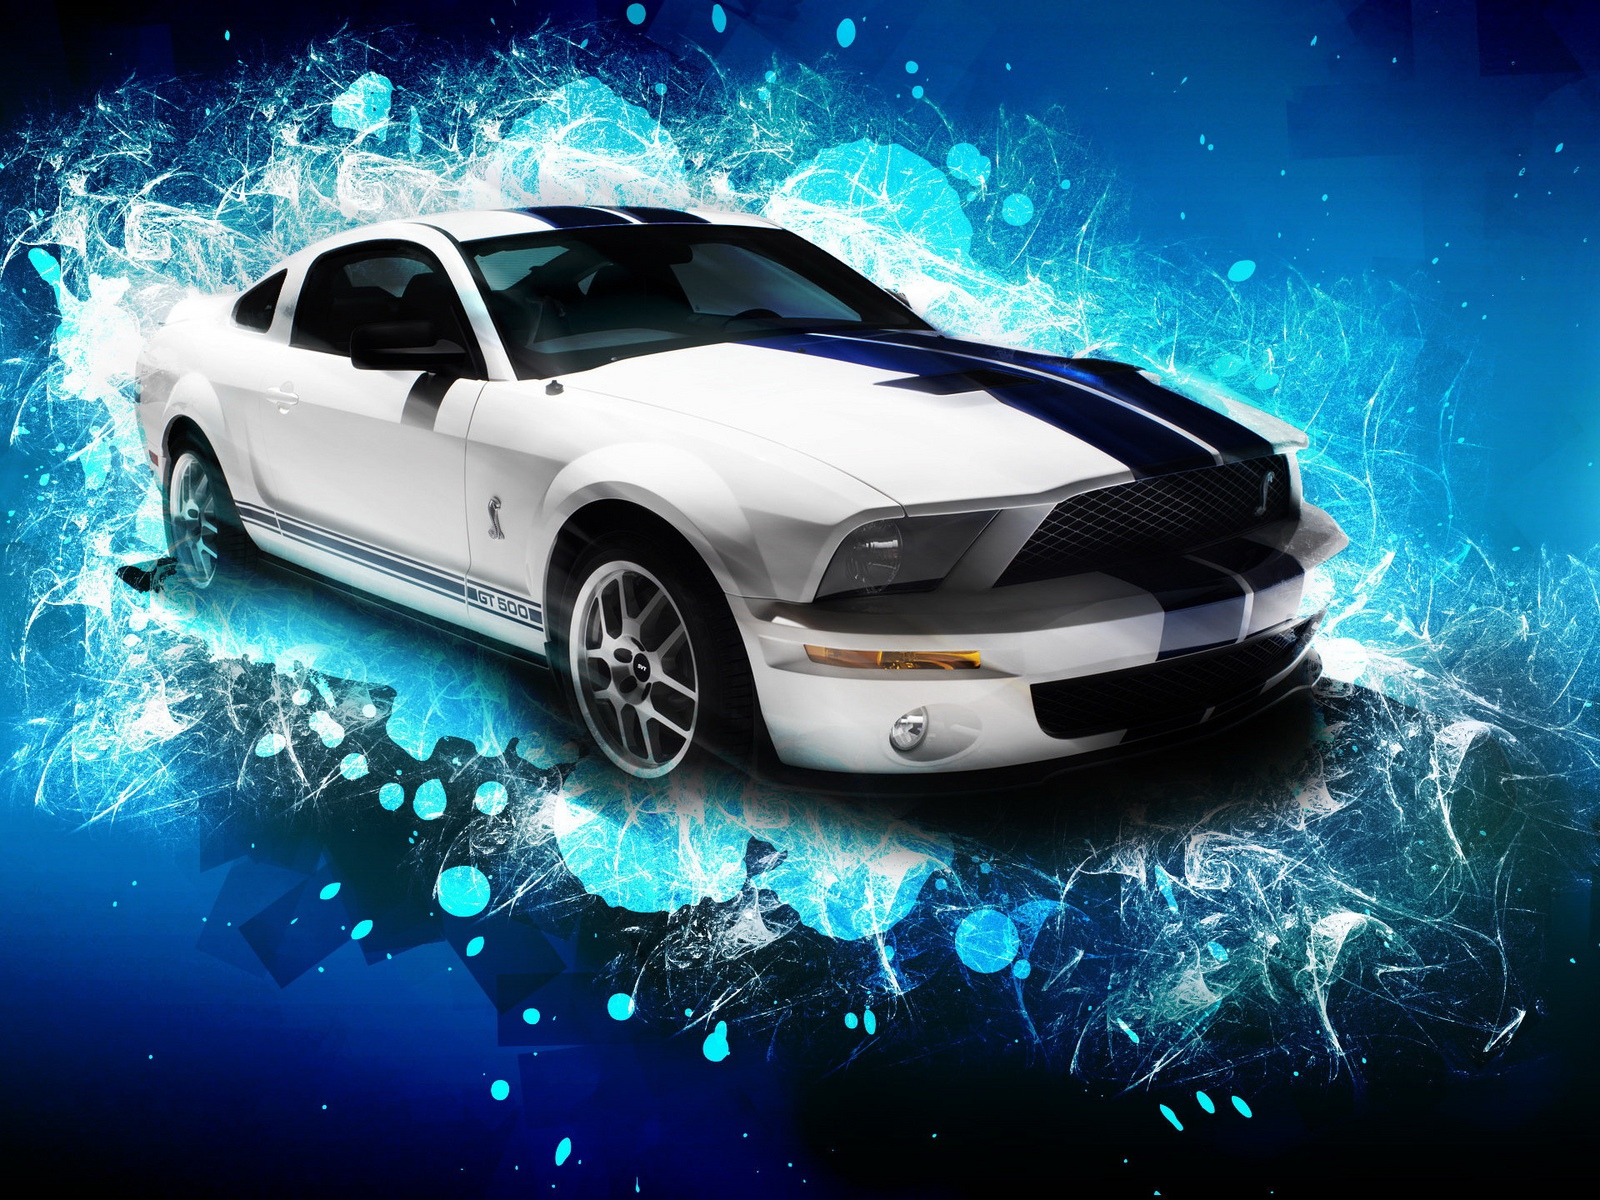 Hd Car wallpapers | Cool Car Wallpapers